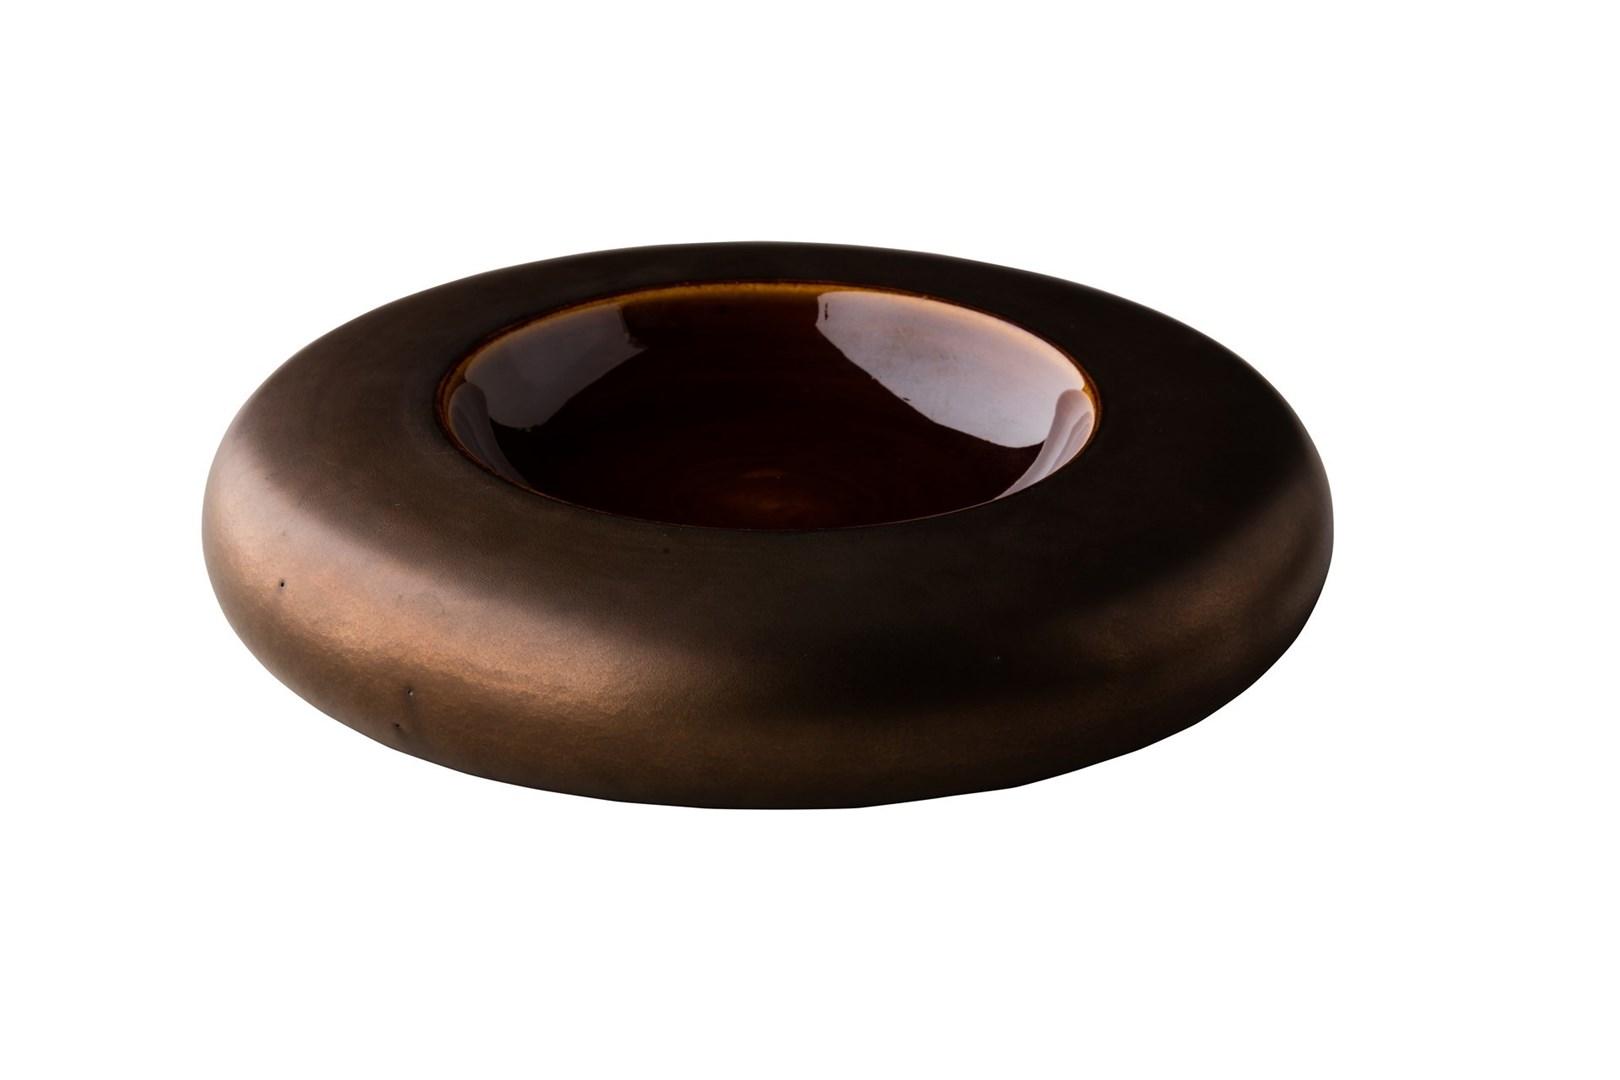 Productafbeelding Donut kom metallic goud 22 cm